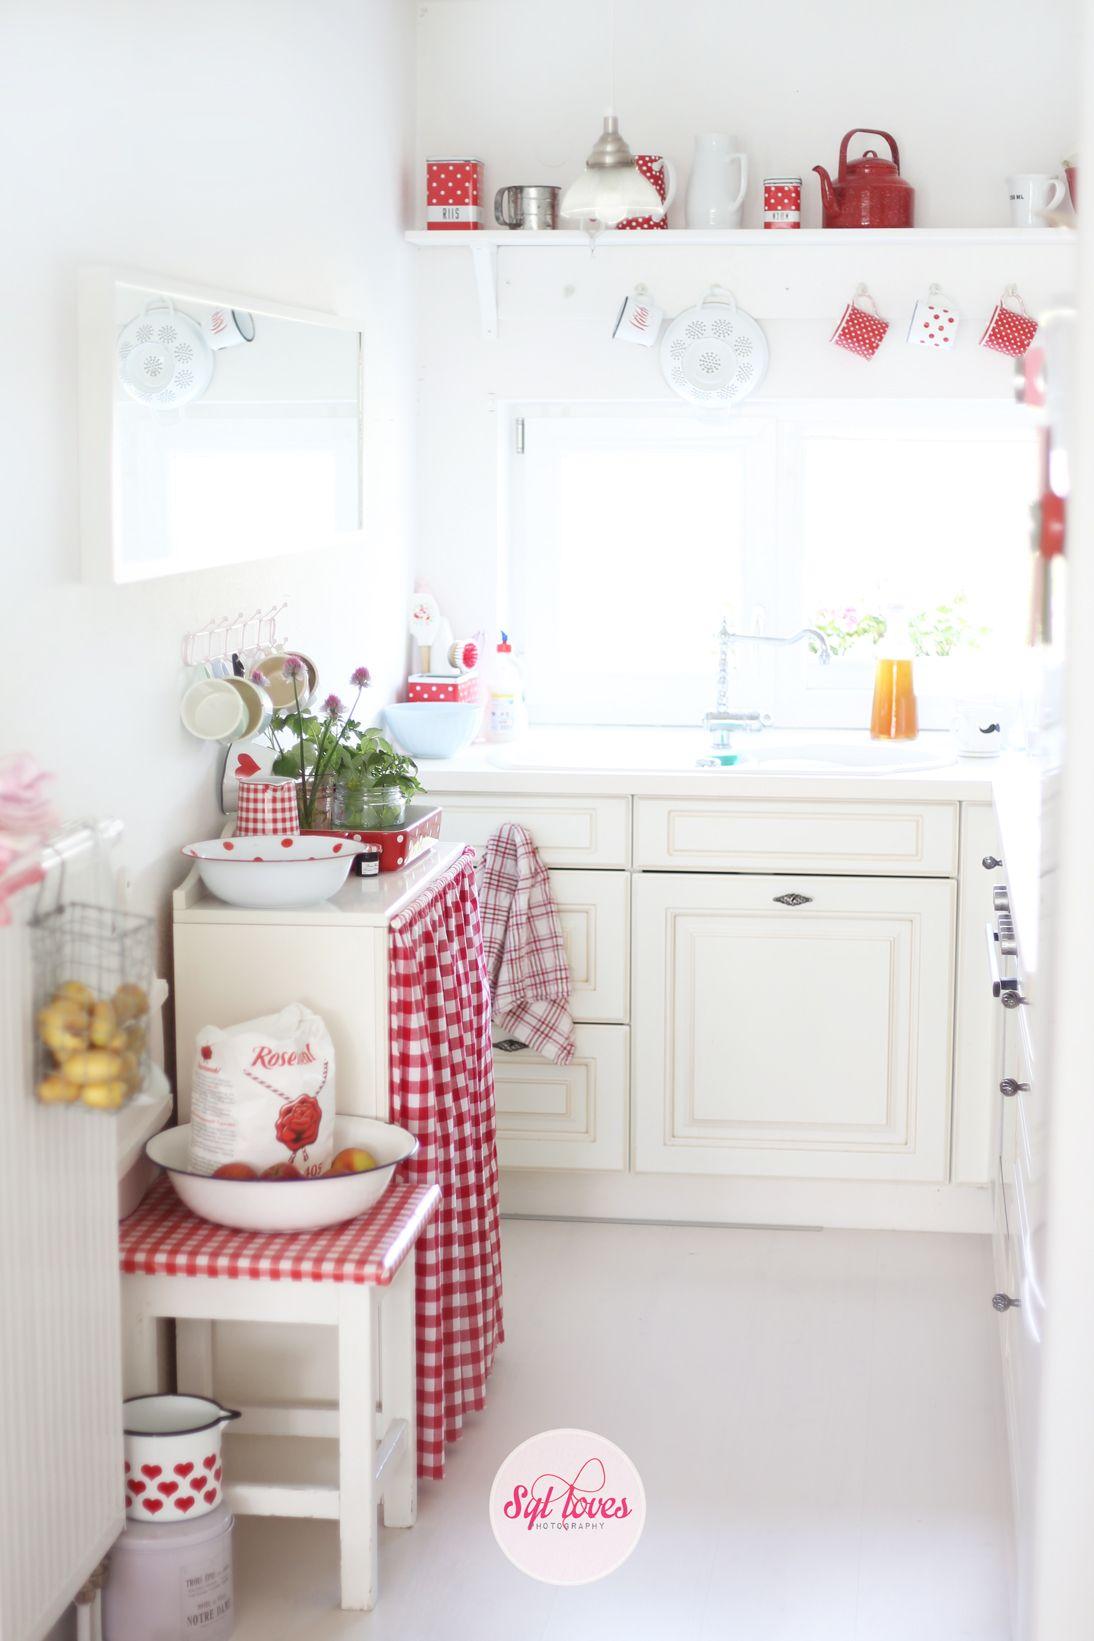 Syl loves, kitchen, red white, gingham, polka dot | Kitchen ...